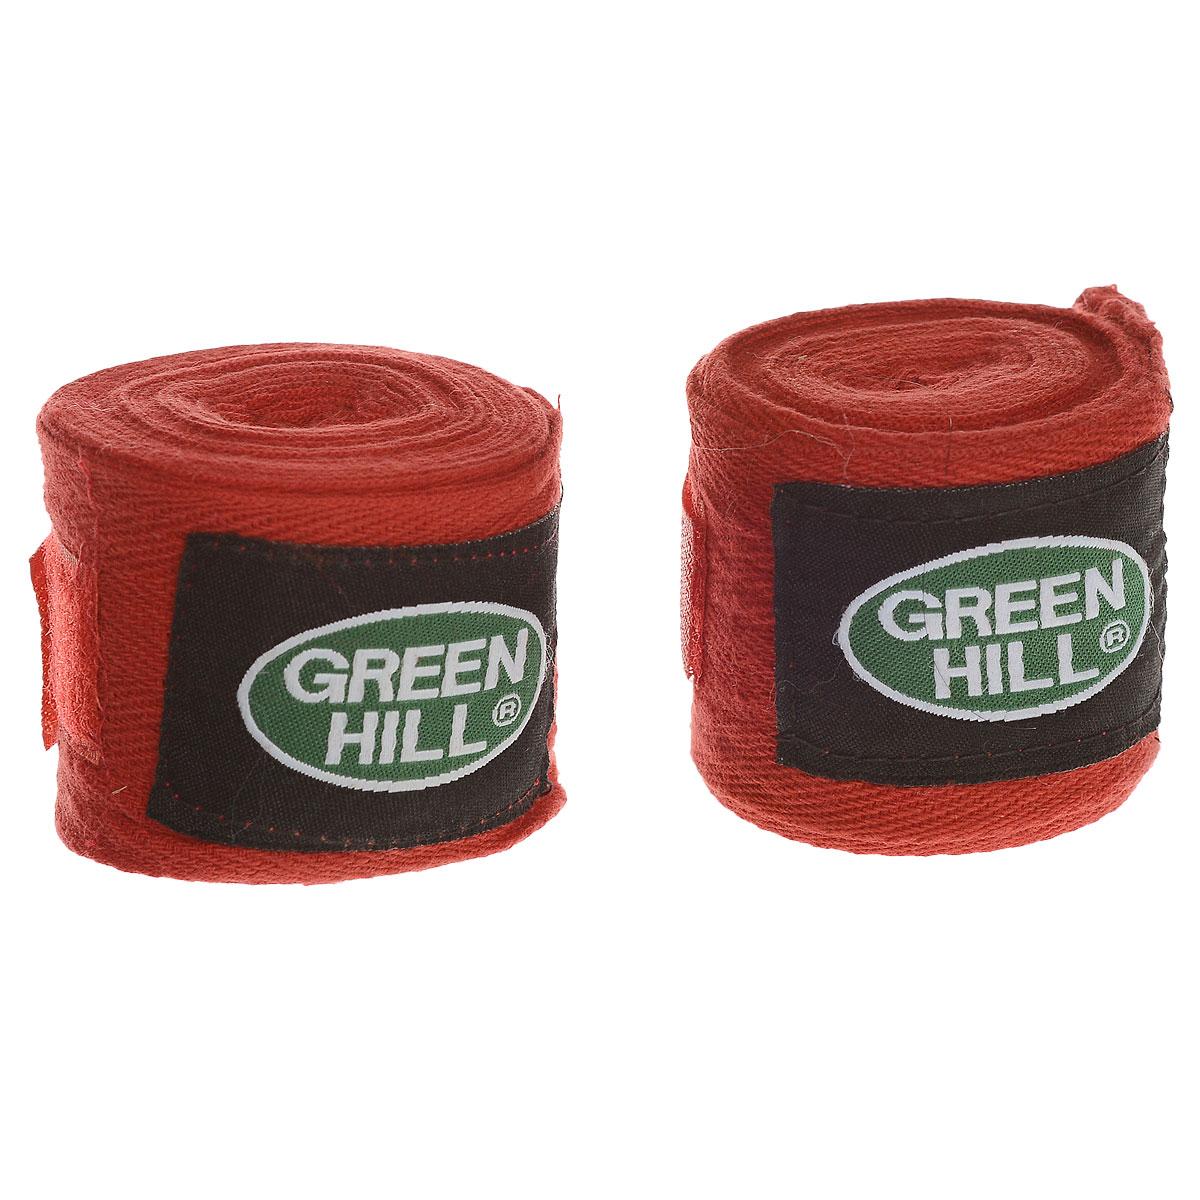 ����� ���������� Green Hill, ������, ����: �������, 2,5 �, 2 �� - Green Hill��-6235-25����� Green Hill ������������� ��� ������ �������� �� ����� ������� ������. ����������� �� ������������������� ������. ����� ������� ������������ �� ���� ��������� �� �������. ����� ������: 2,5 �.